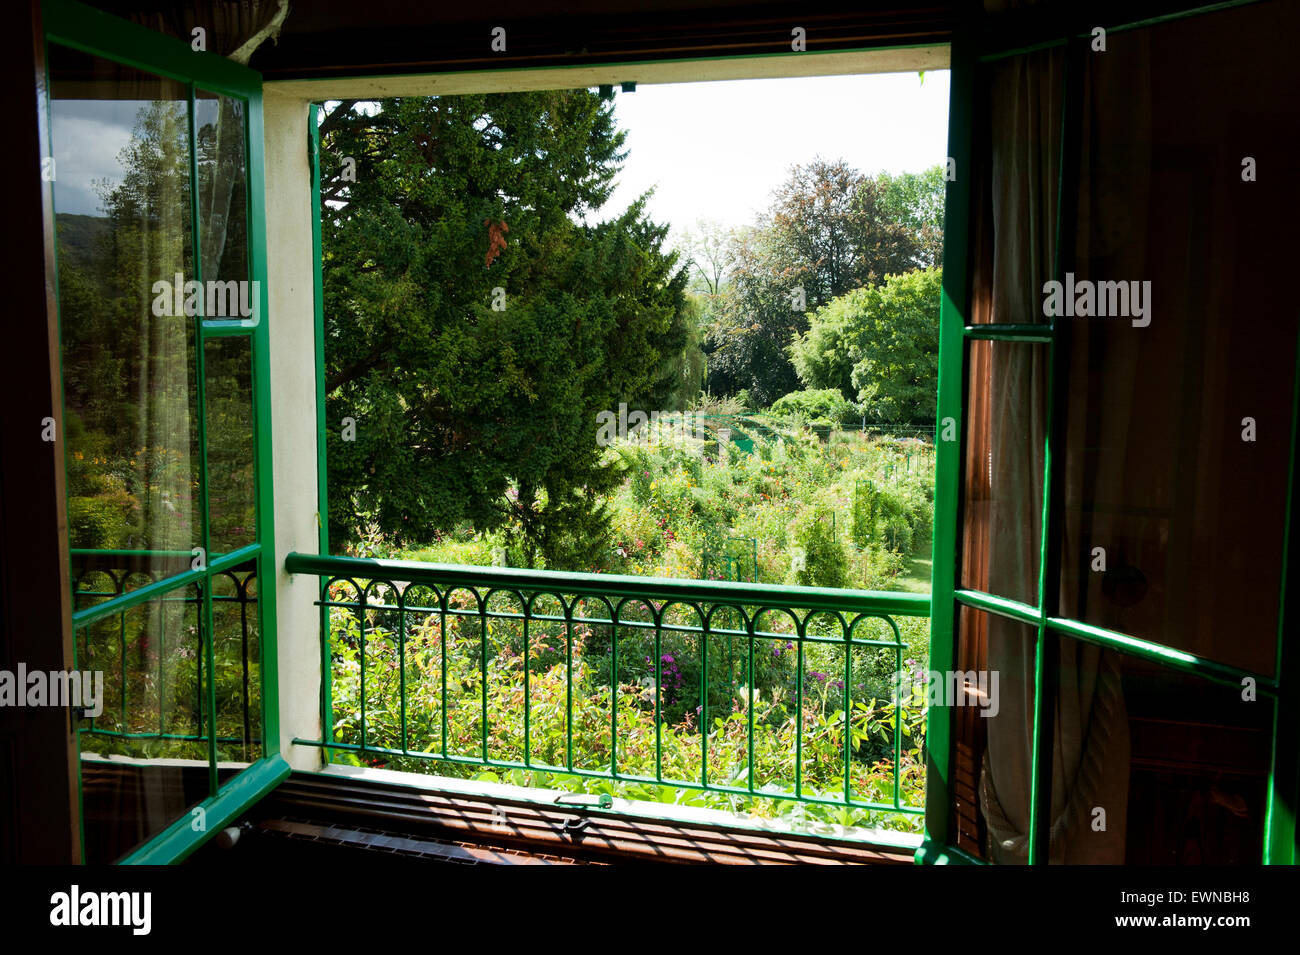 Claude Monet garden giverny departement eure france europe Stock Photo